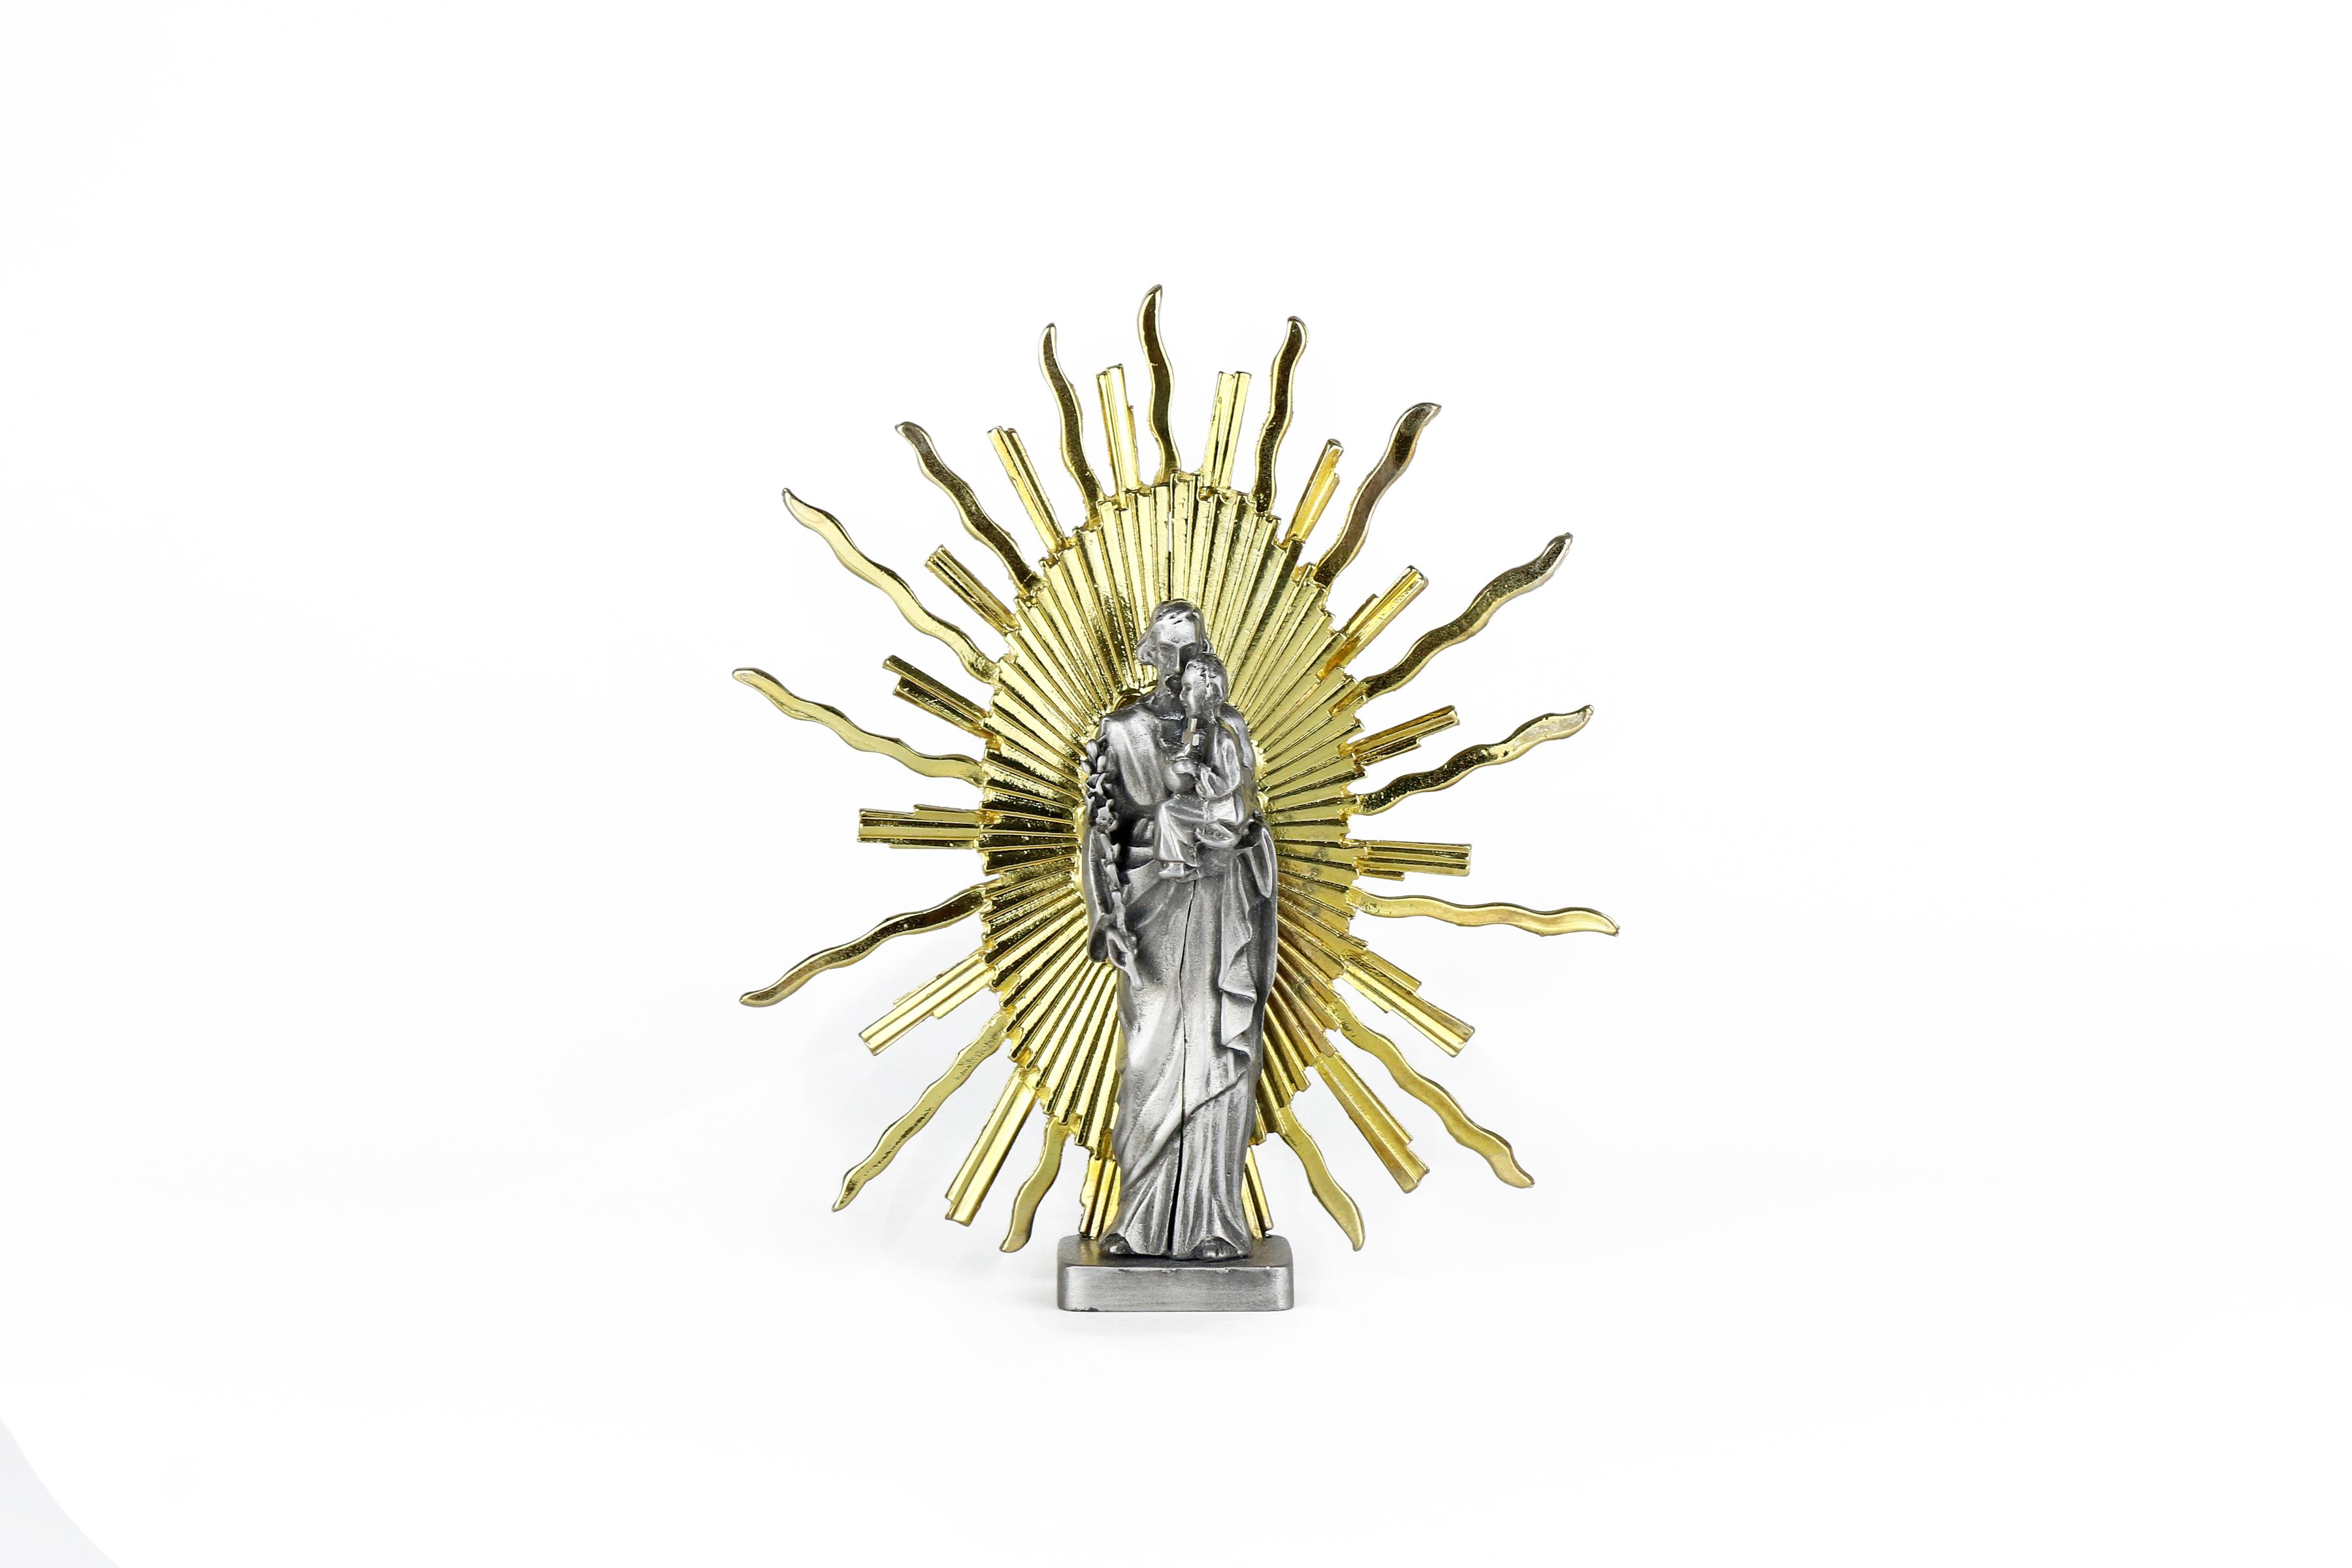 oratoire-st-joseph-statue-etain-st-joseph-rayons